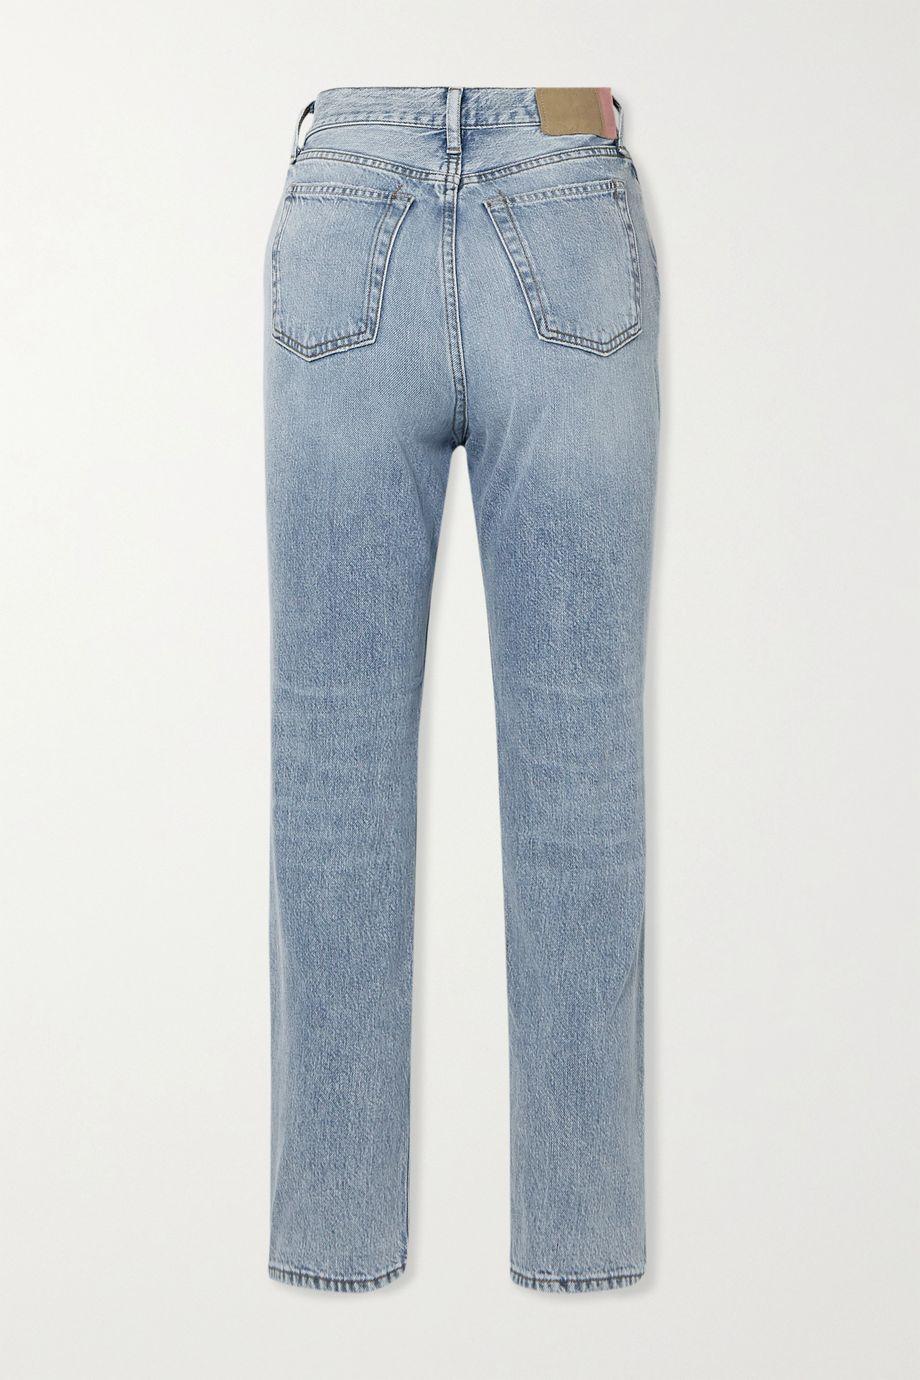 Acne Studios + NET SUSTAIN high-rise straight-leg jeans